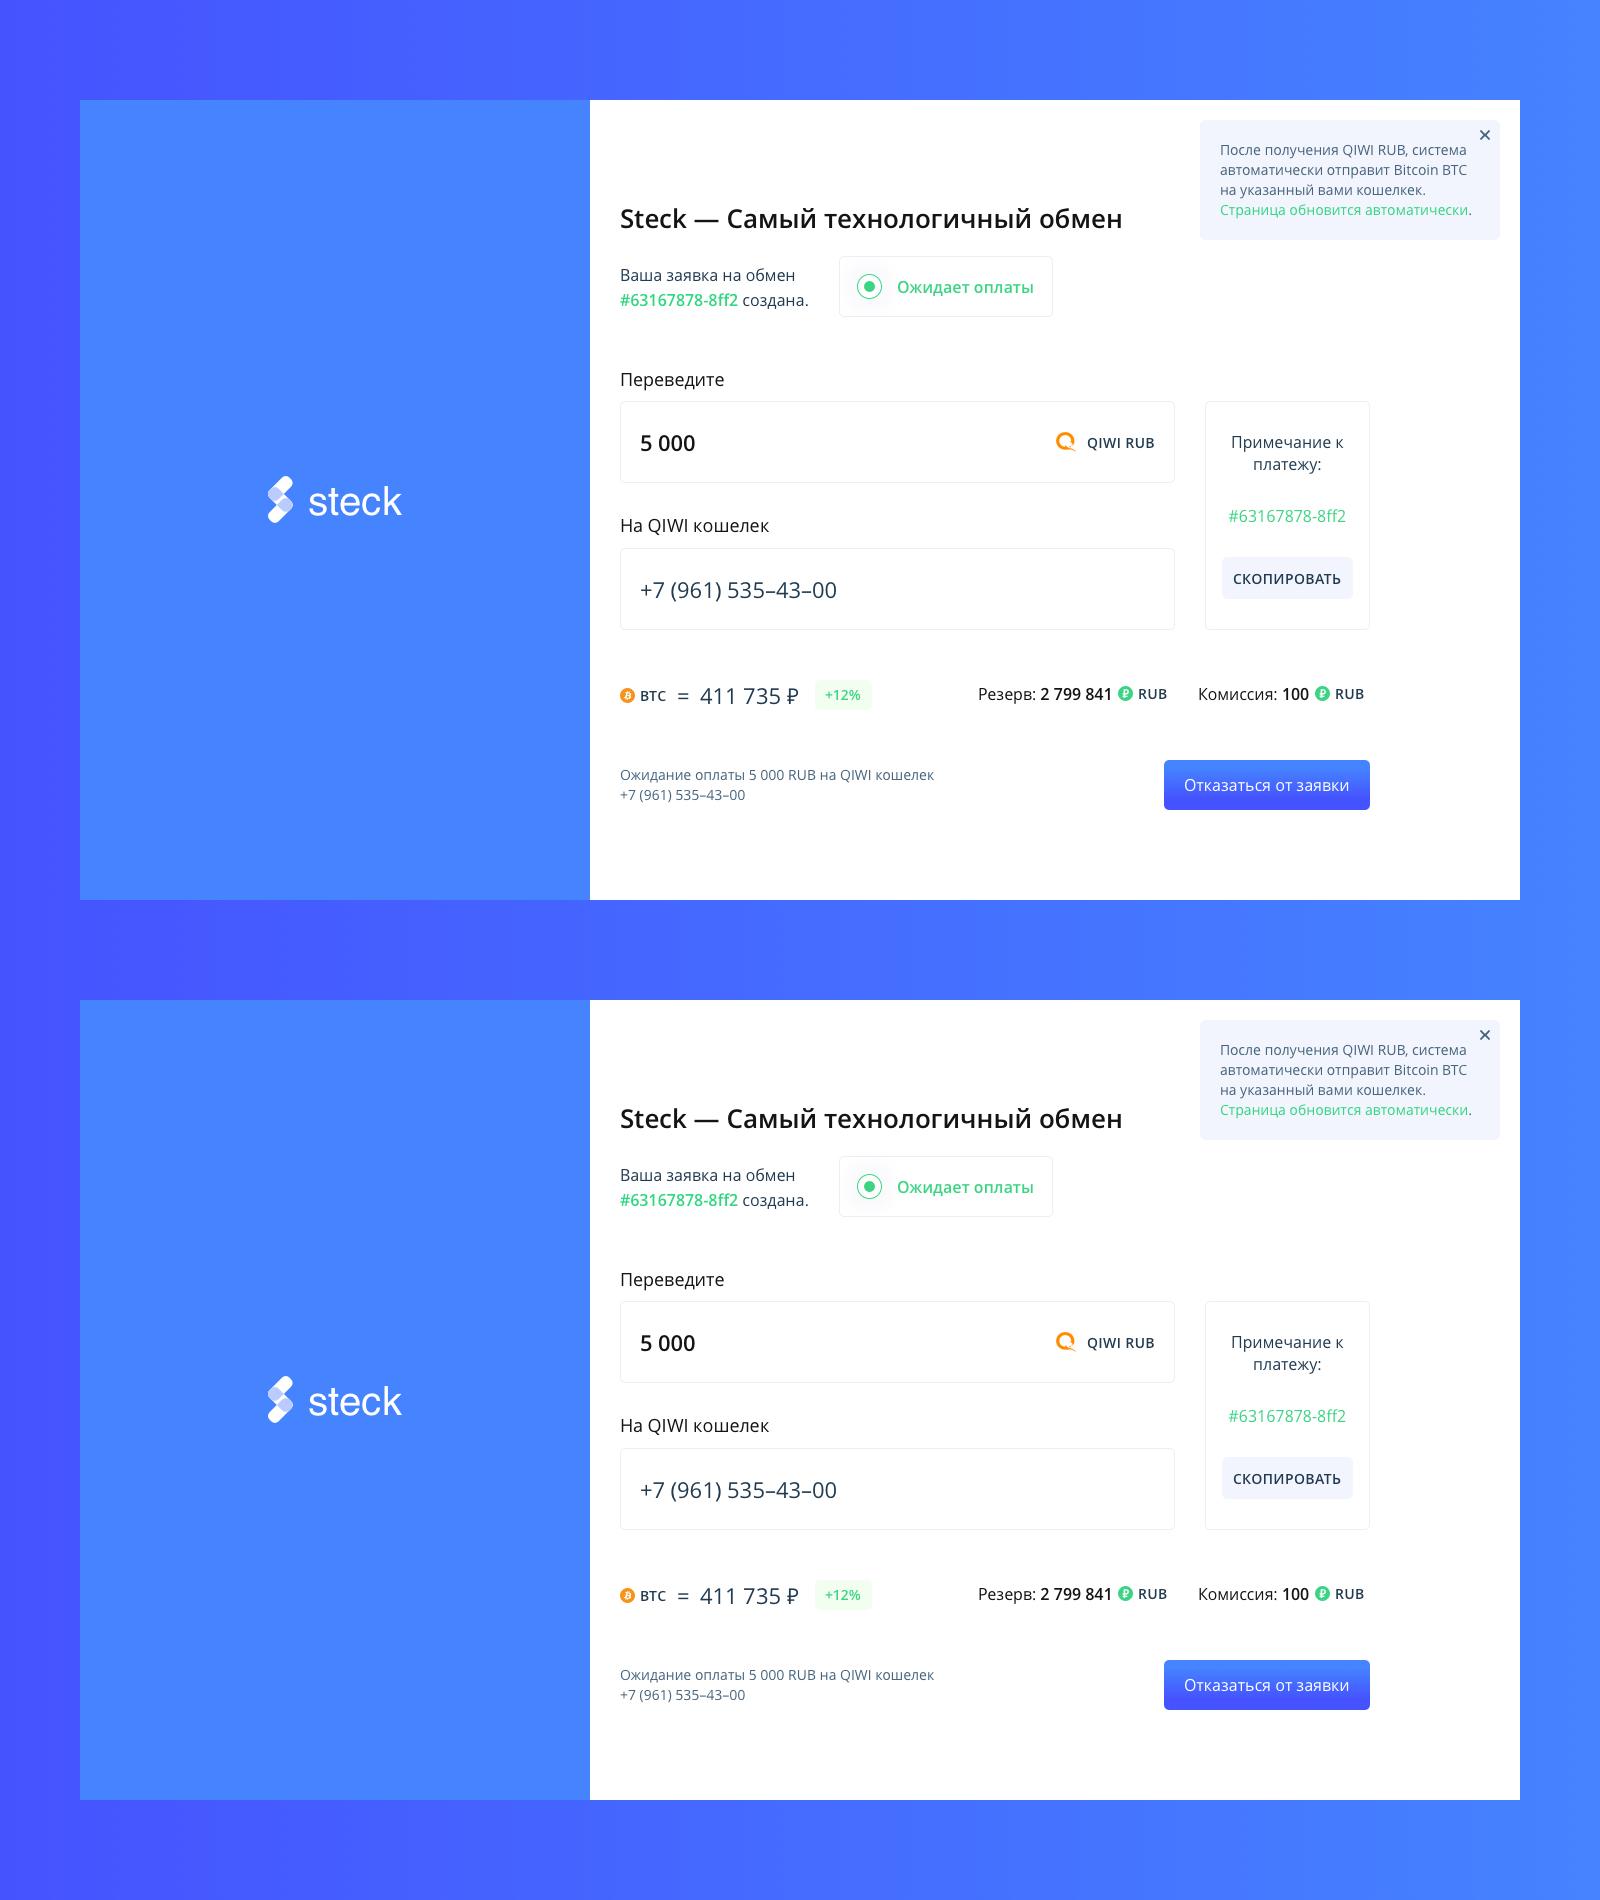 steck.Swap — Сервис по технологичному обмен и покупке криптовалют